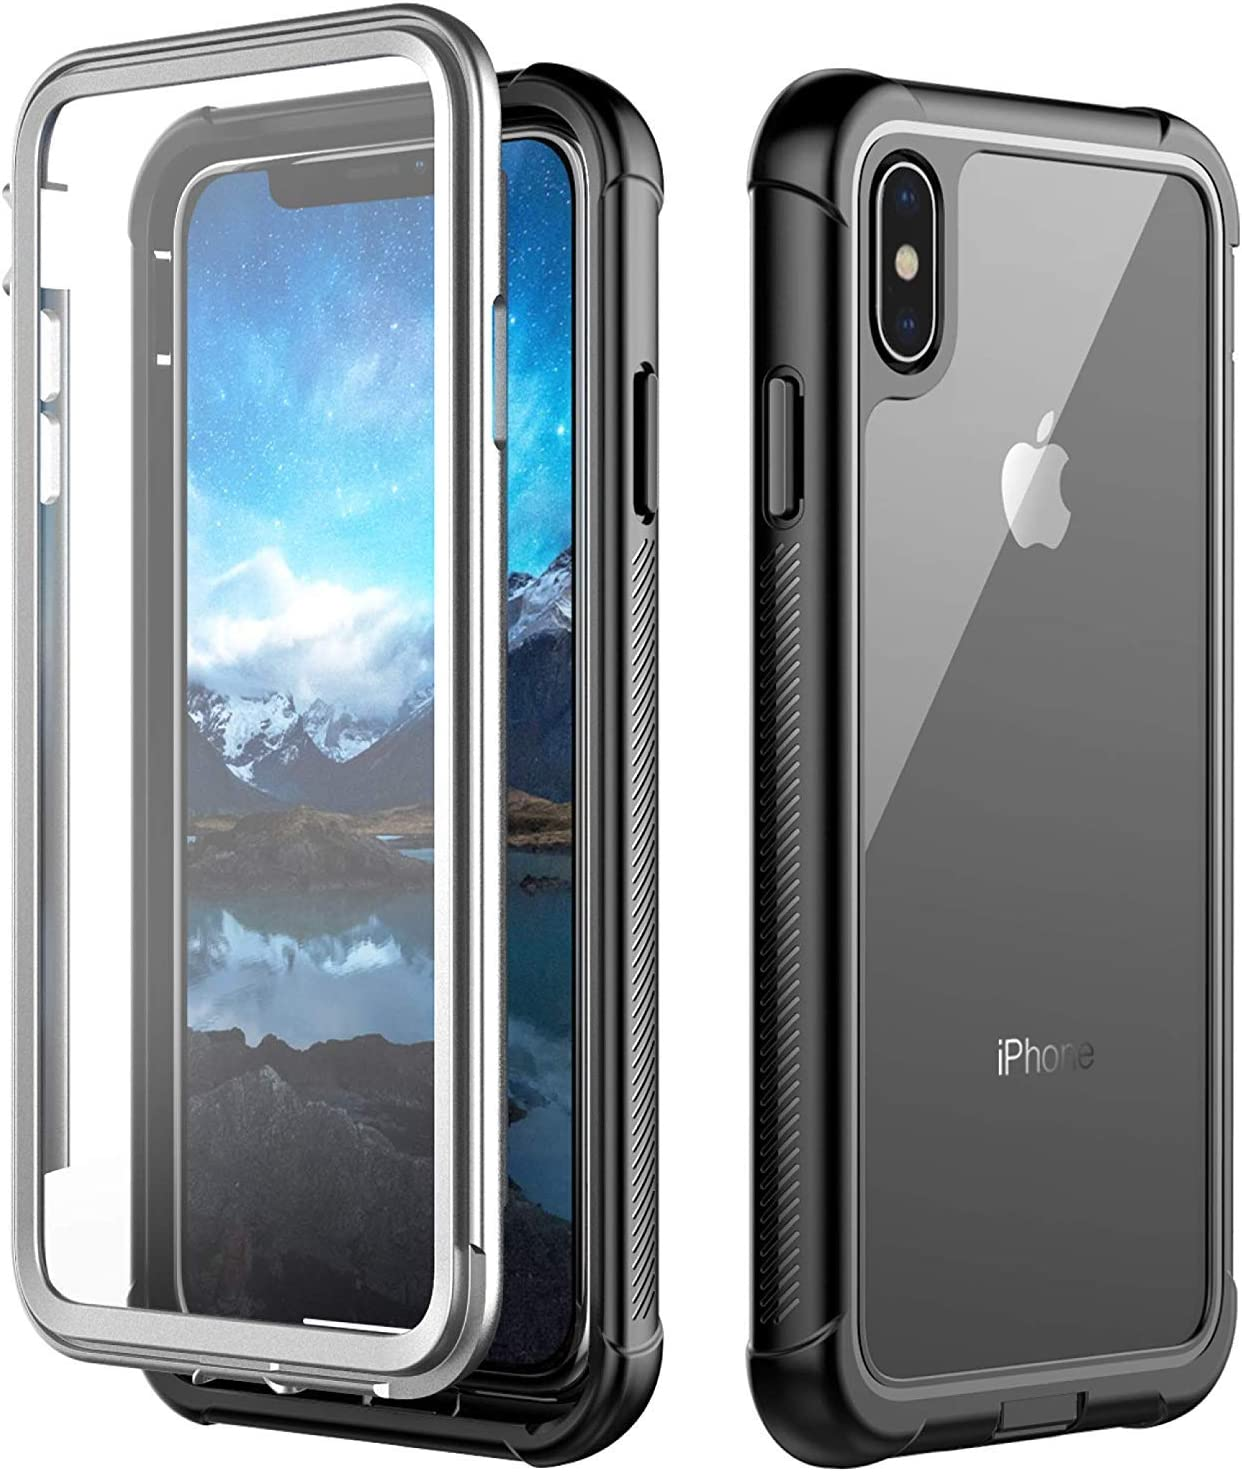 APPLE - Cover per iPhone X Colore Blu Cosmo - ePRICE